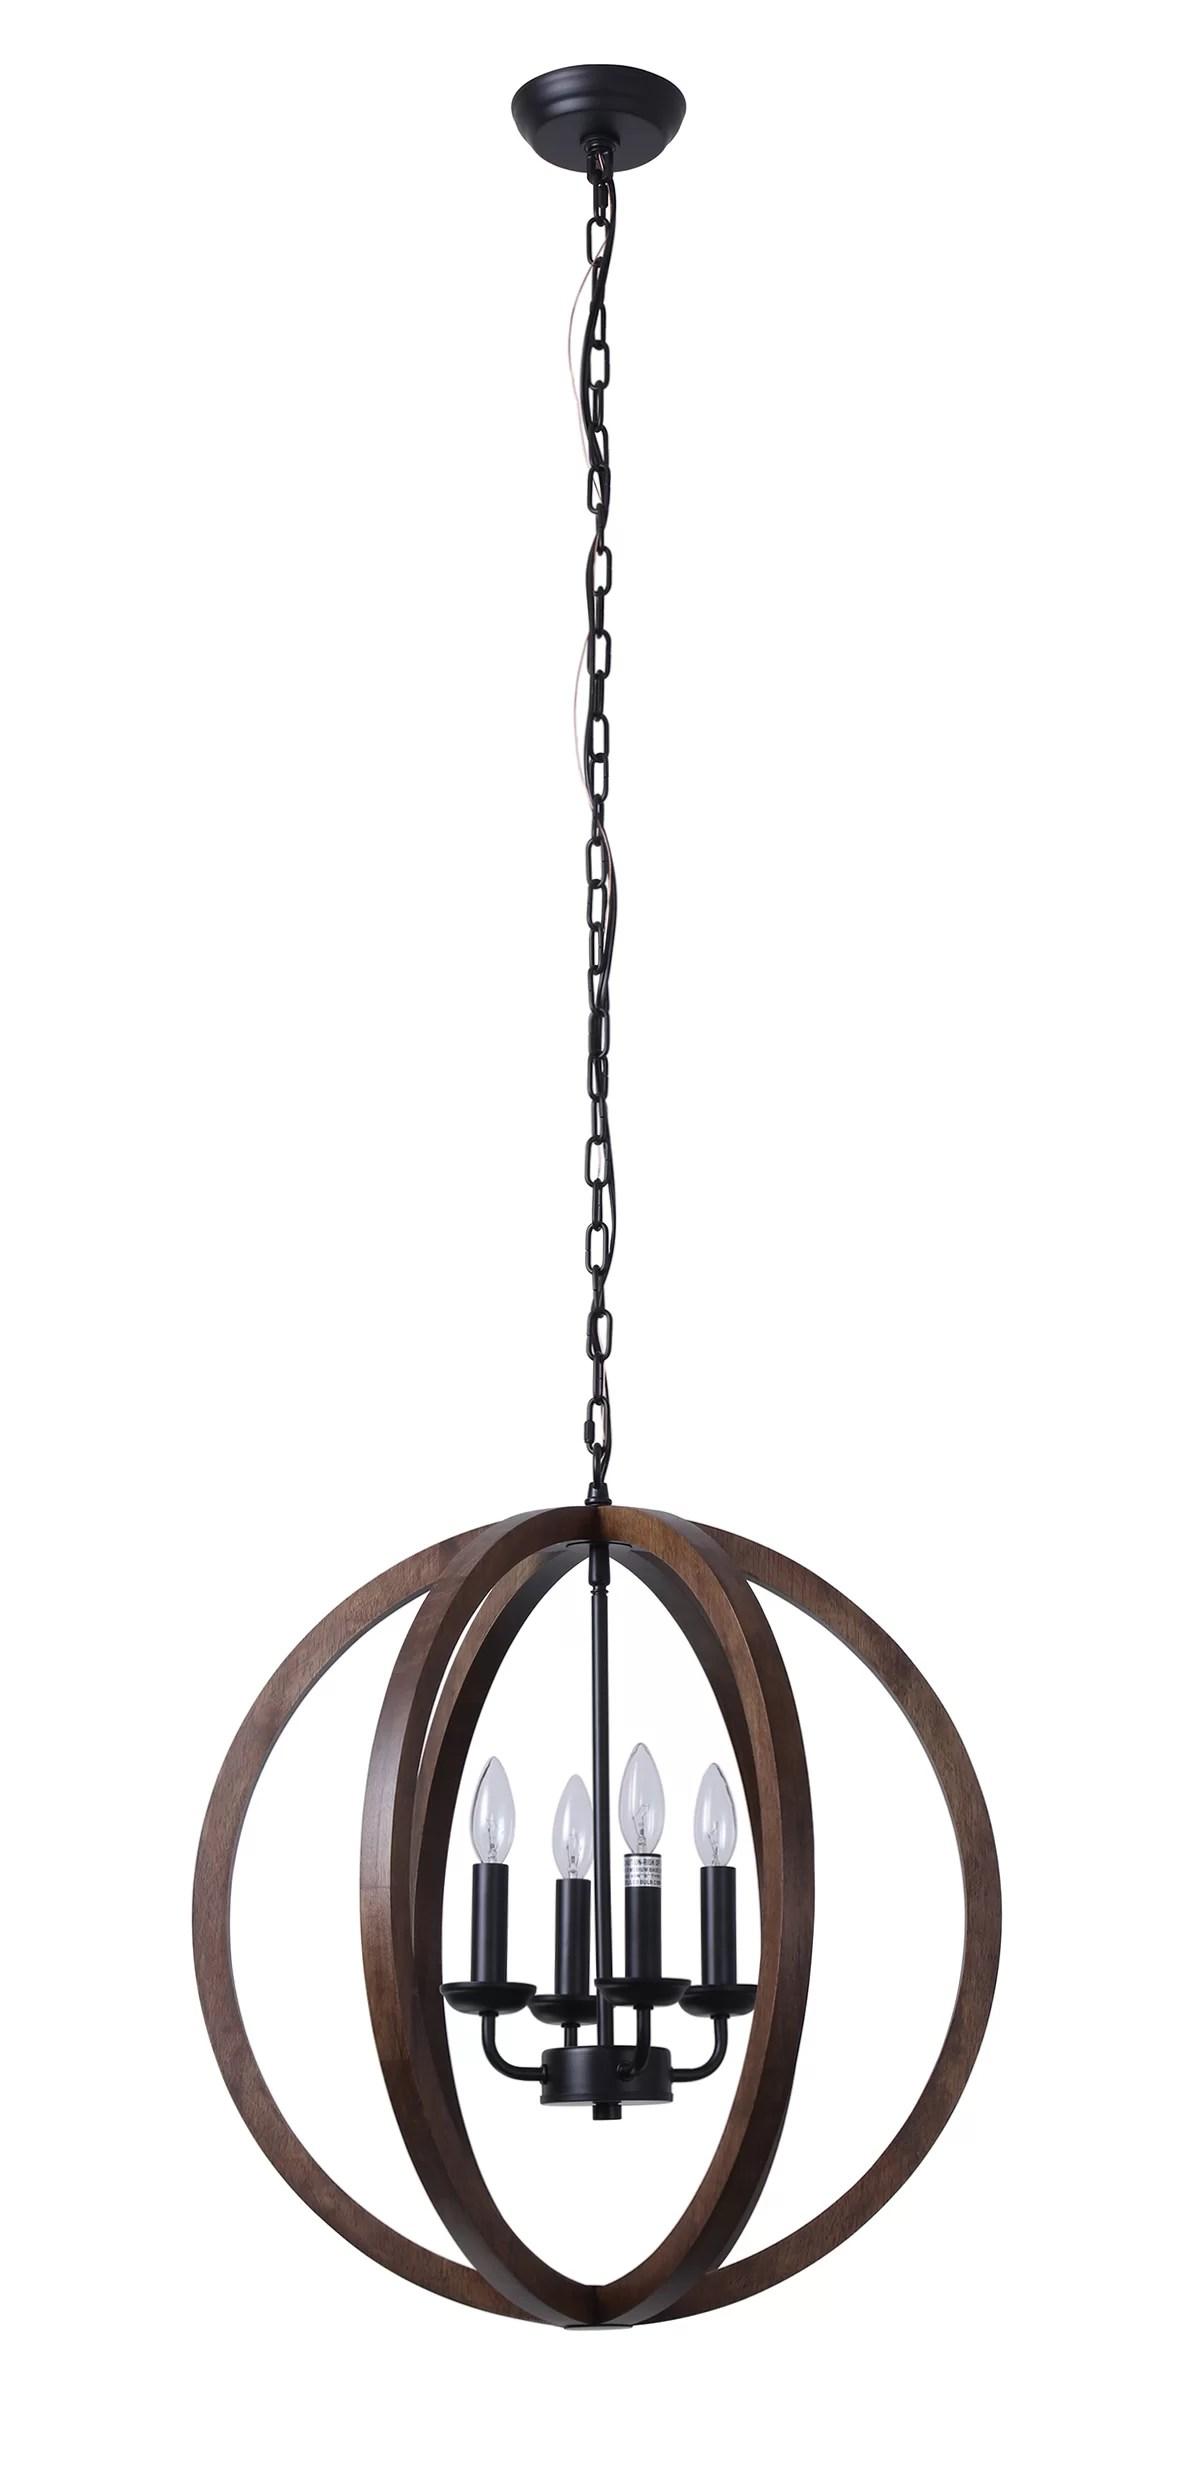 hight resolution of linealighting terra 4 light globe chandelier wayfair ca terra 4 light crystal chandelier wayfair on basic electrical wiring